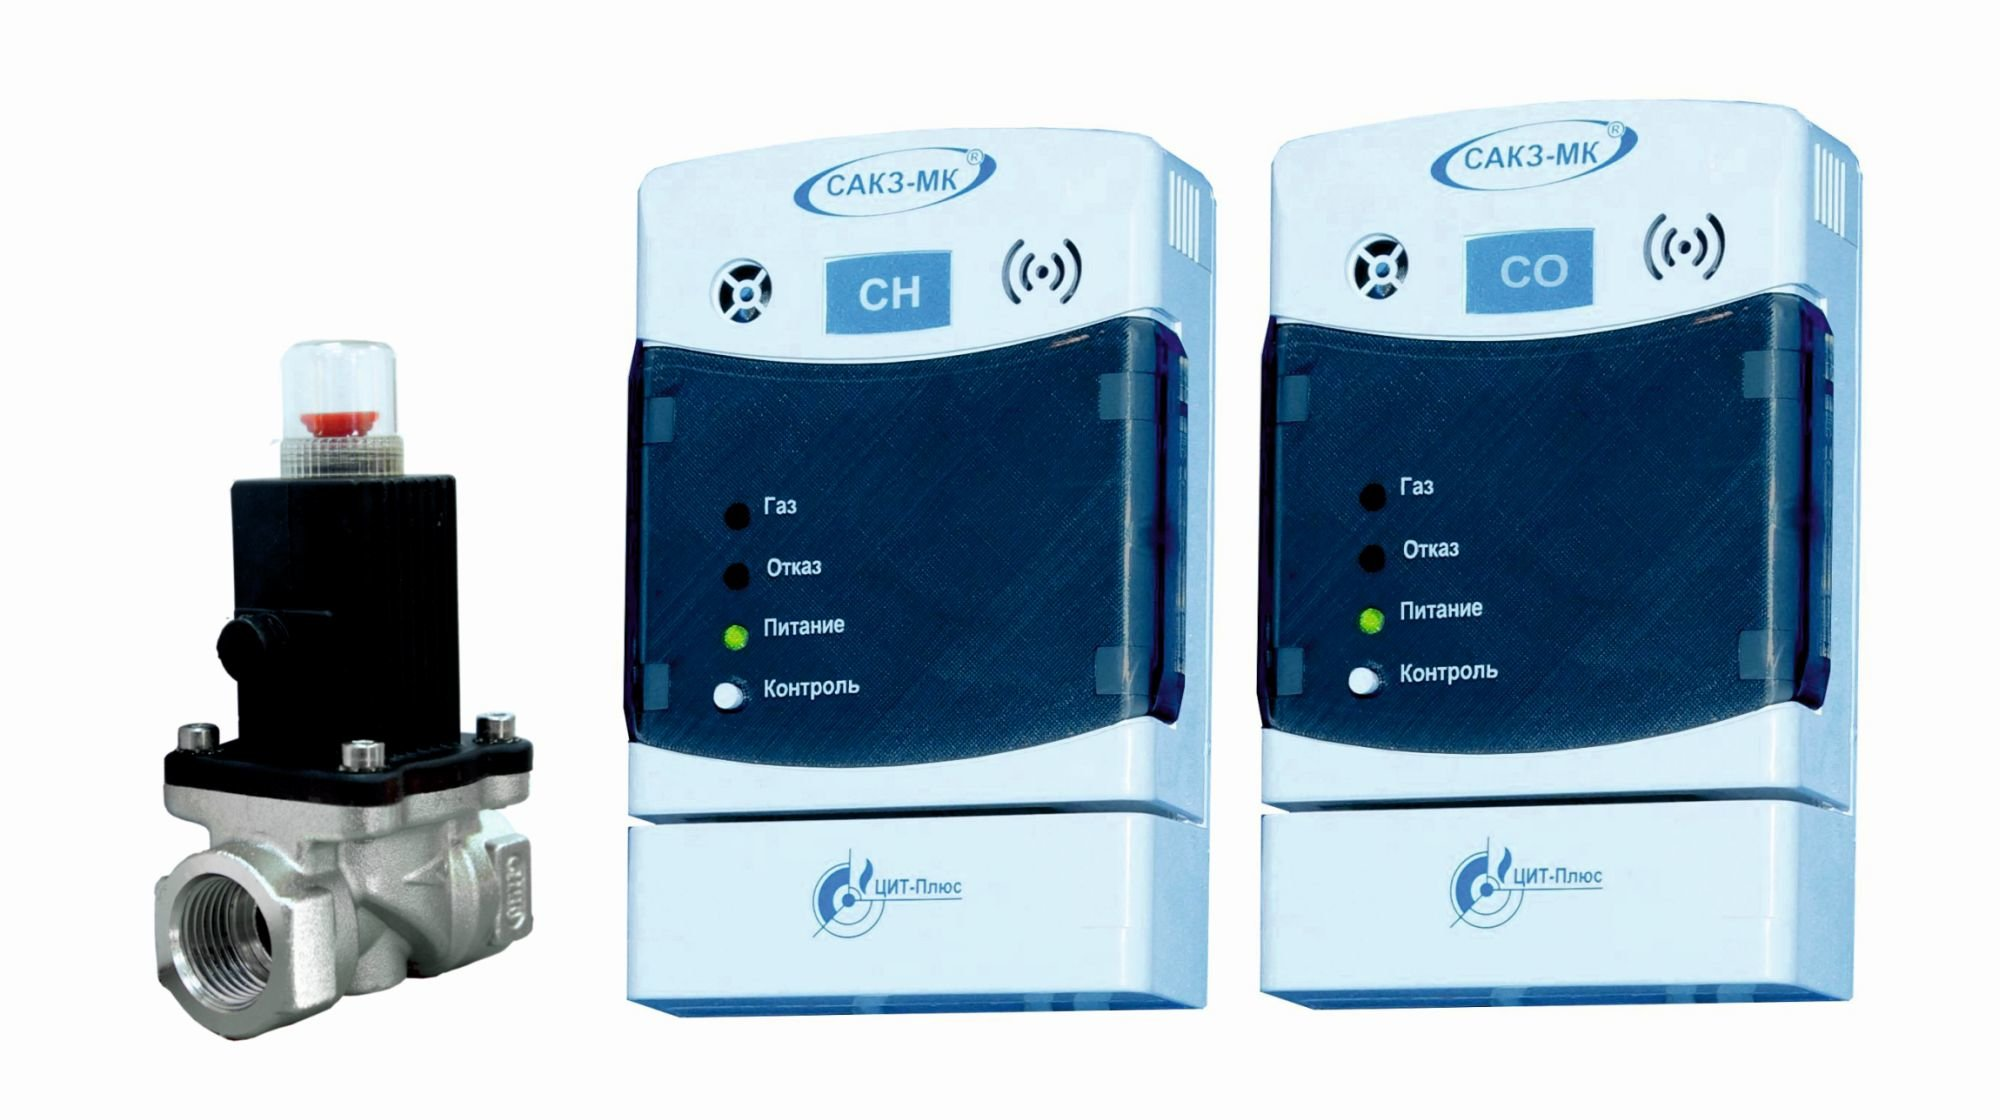 система контроля загазованности сакз-мк-2 цена